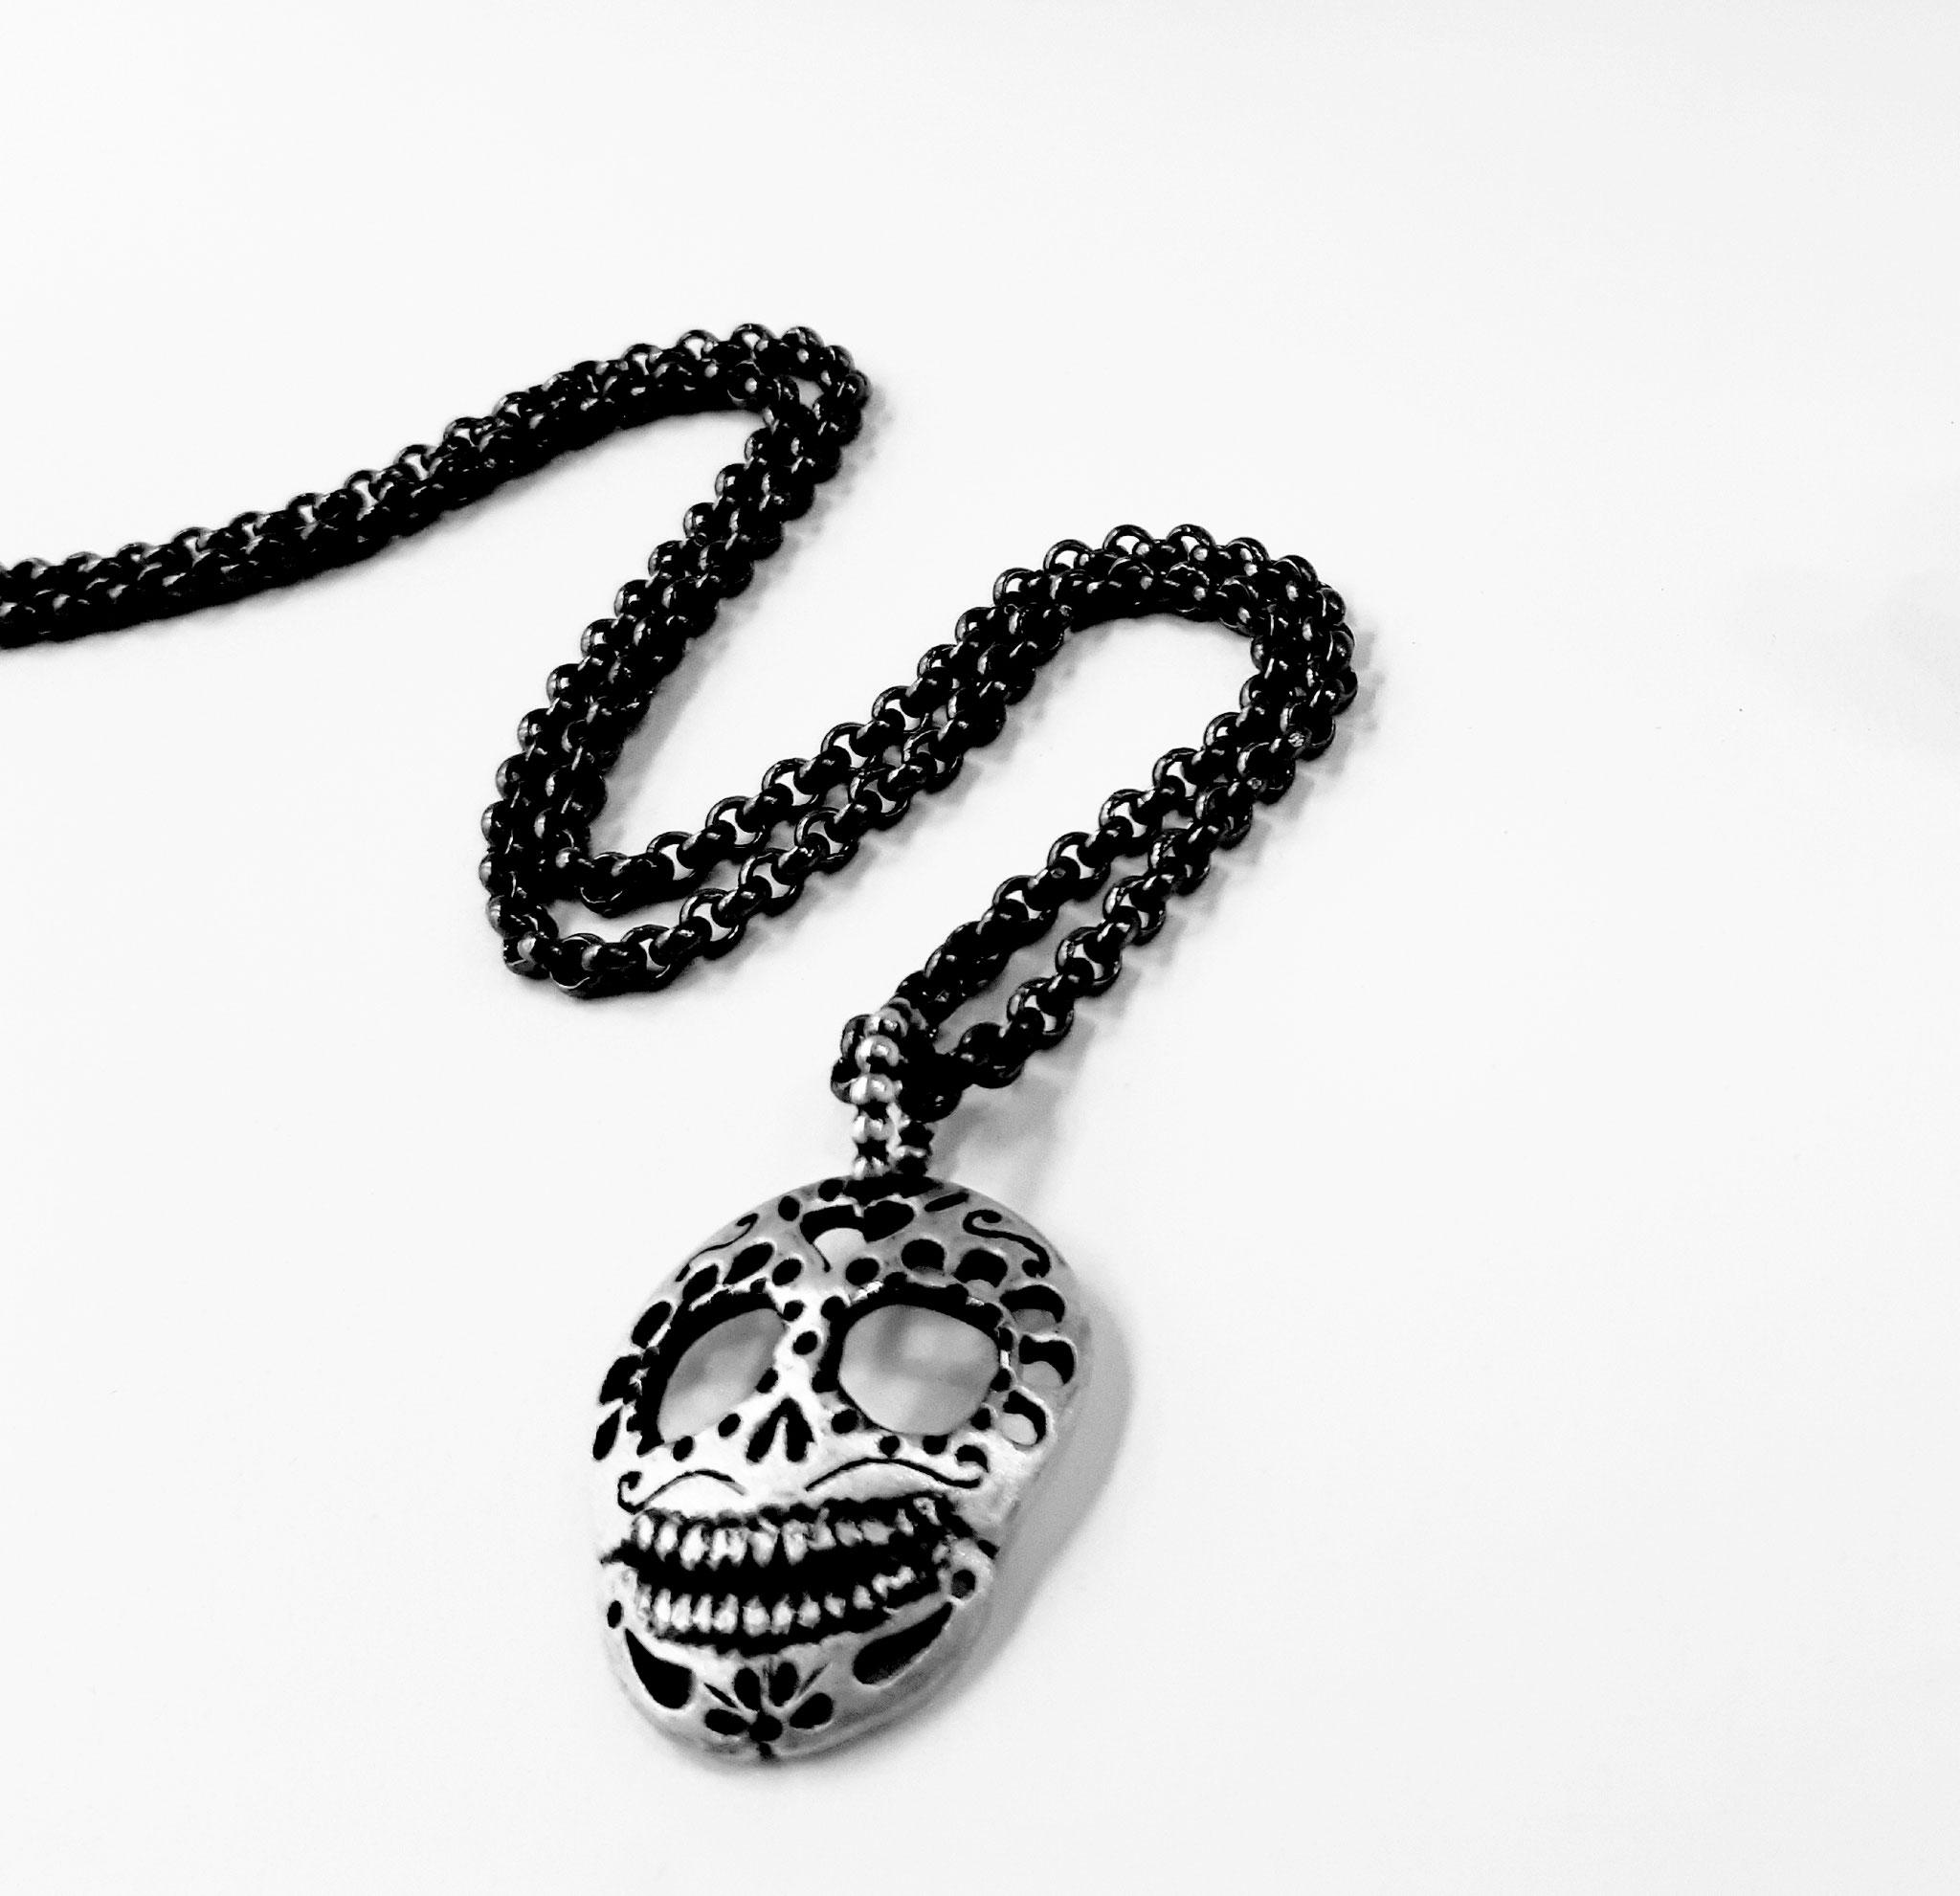 Calavera de Dulce Sonja Markhoff Artistic Jewelry